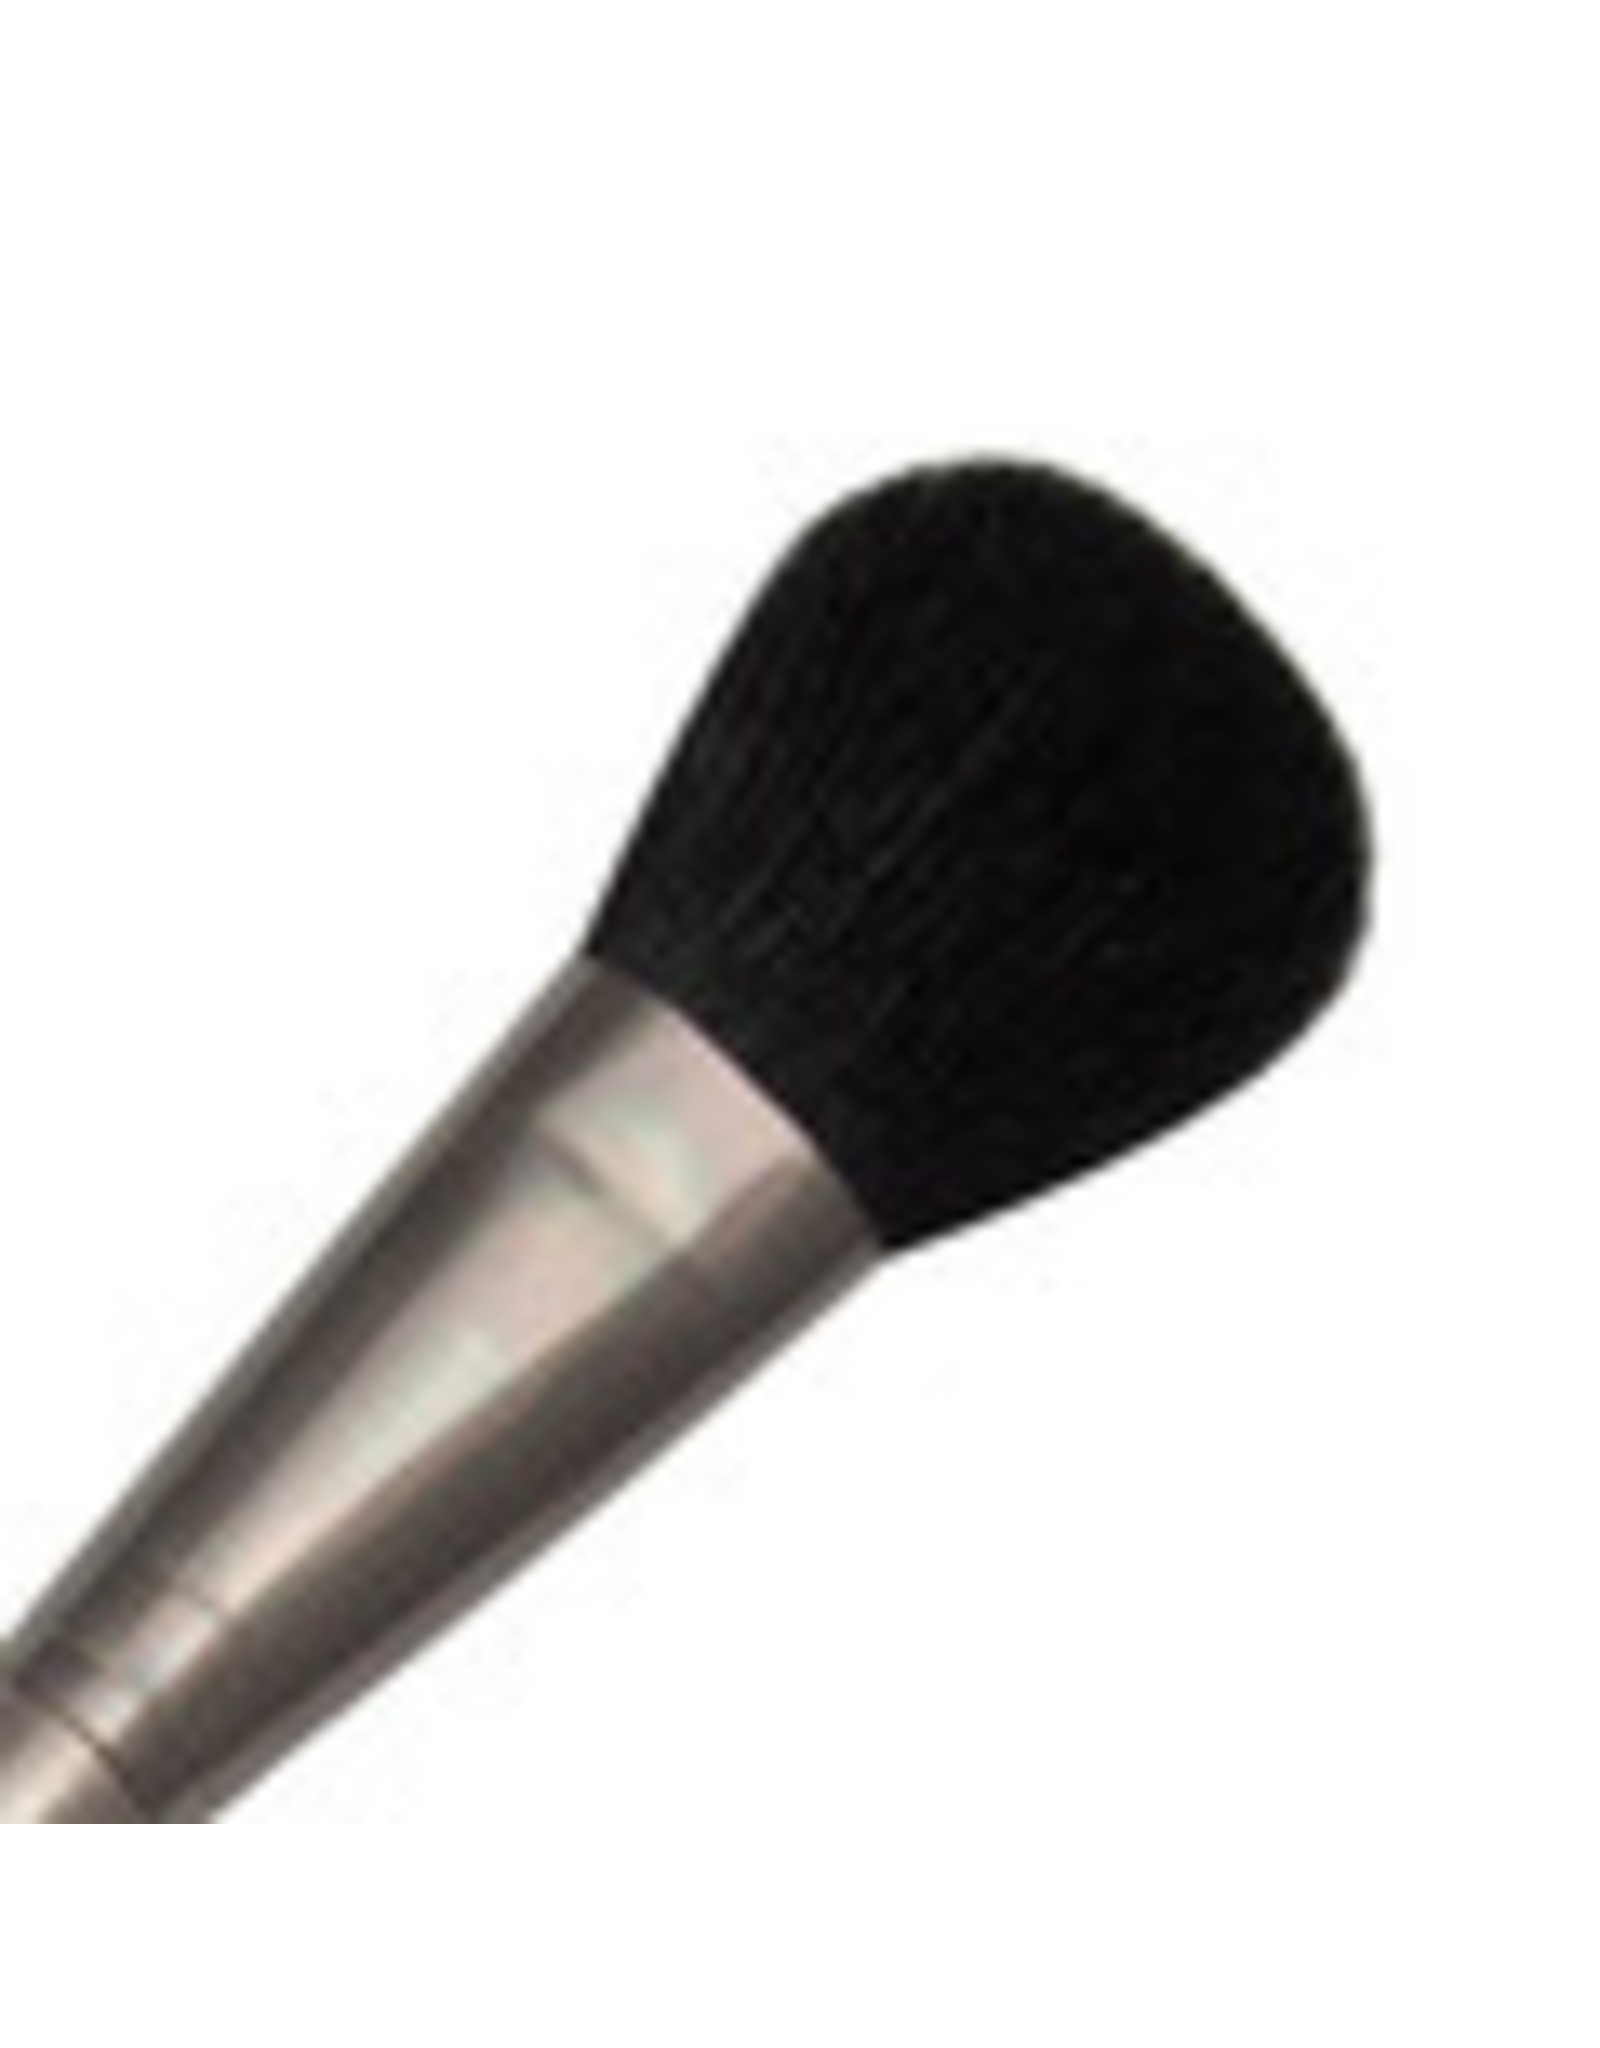 Royal & Langnickel Zen 83 Series Black Goat Mop 25mm brush